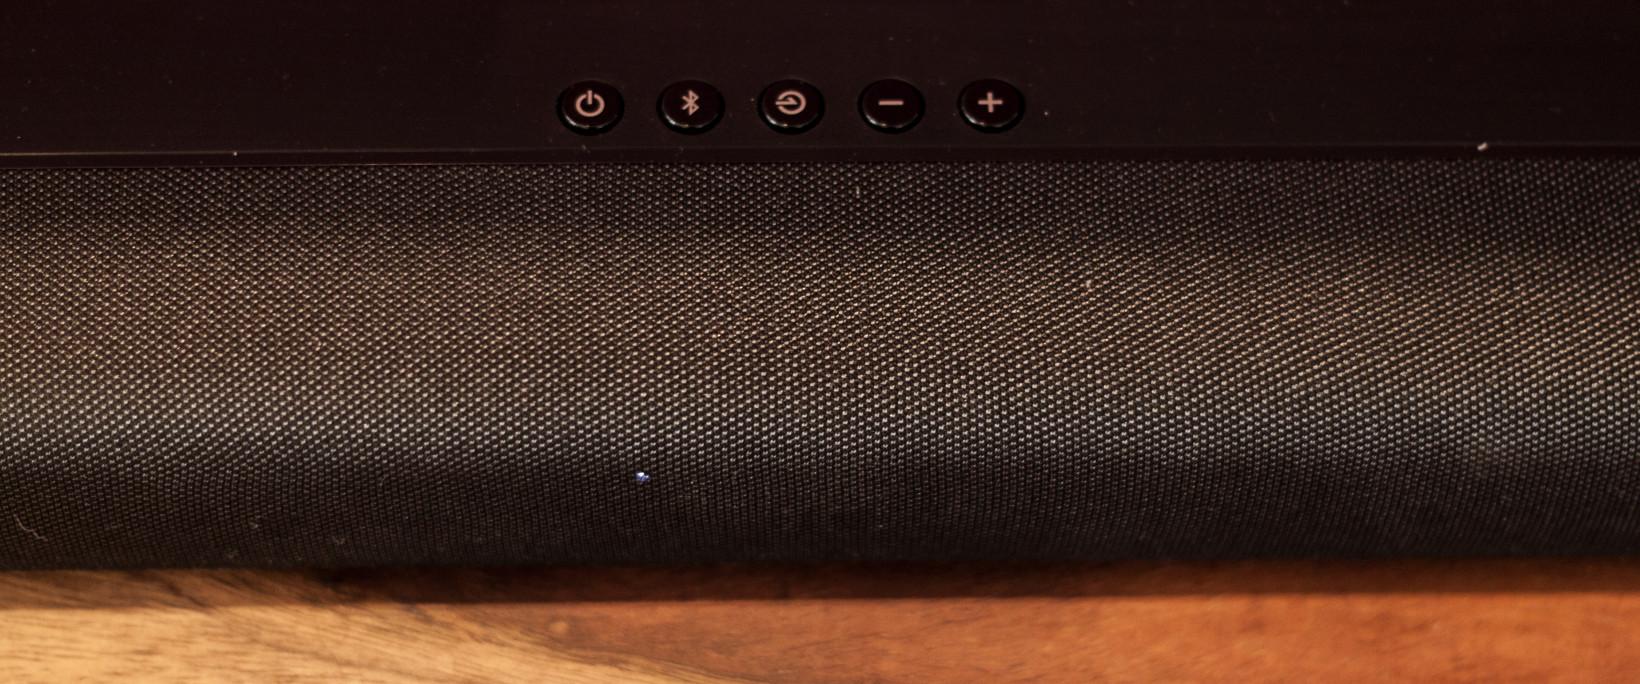 Polk Audio's Signa S1 soundbar upgrades your living room on the cheap